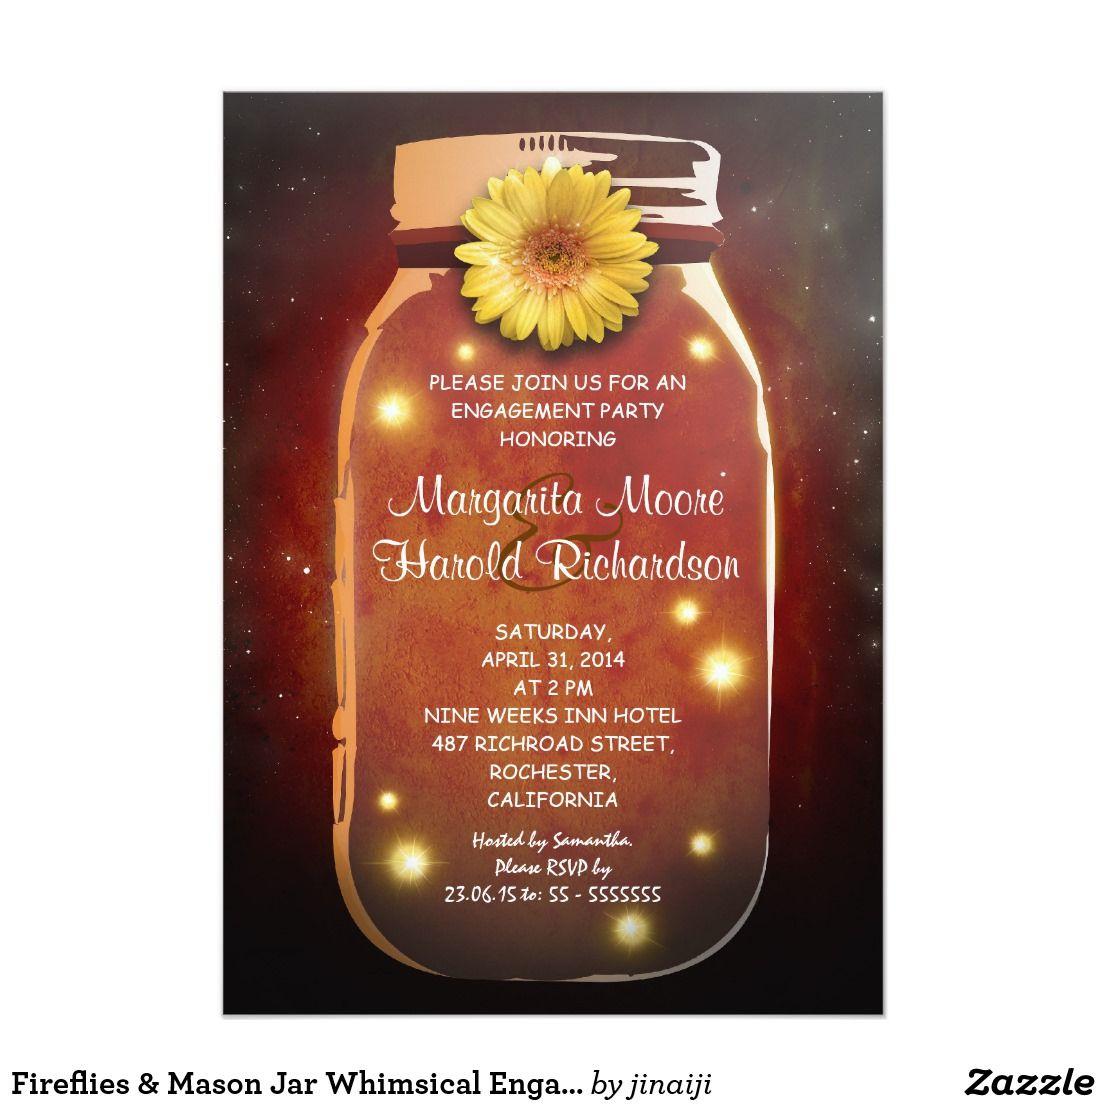 Fireflies & Mason Jar Whimsical Engagement Party Invitation ...